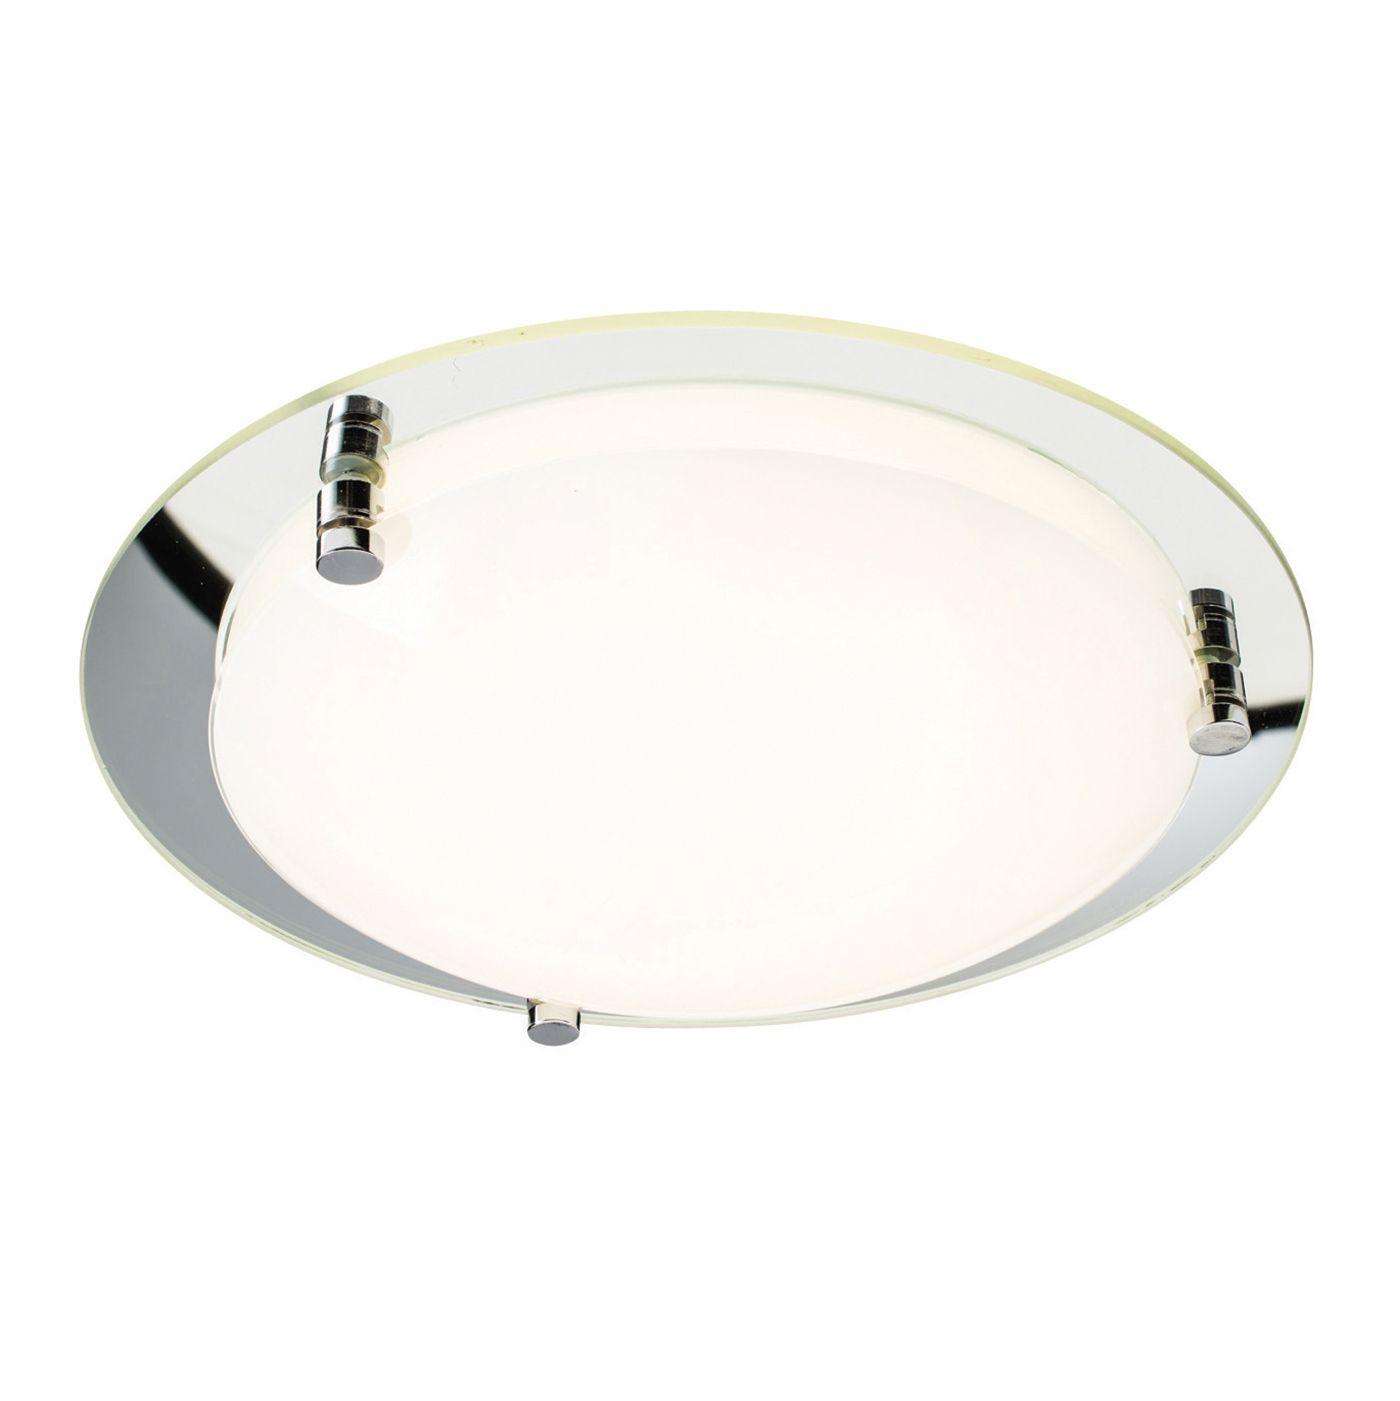 Minimalistyczny plafon Foster 30 - szklany - Endon Lighting